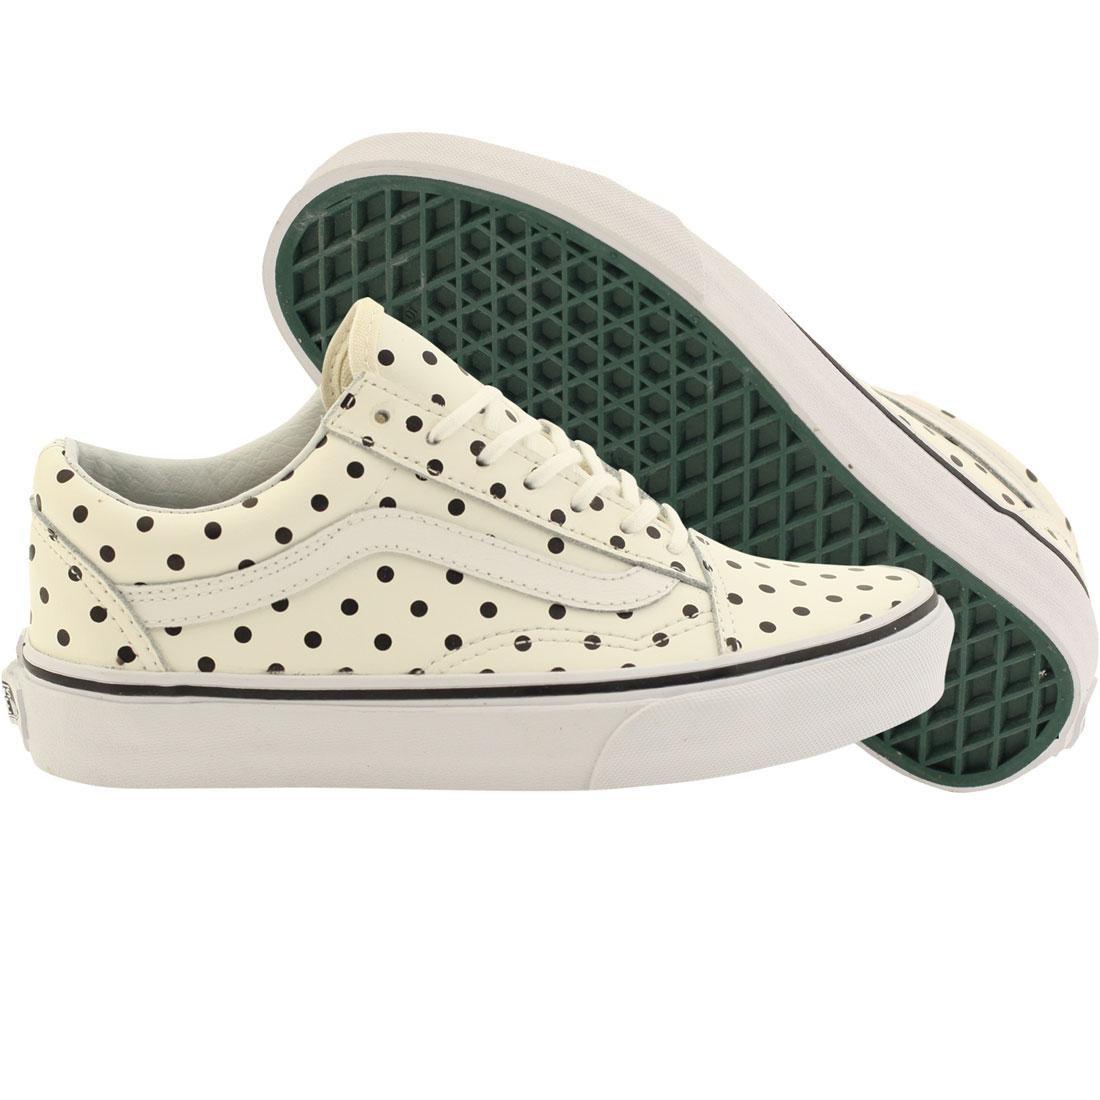 946b02ac9410d2 Vans Women Old Skool - Leather Polka Dots white